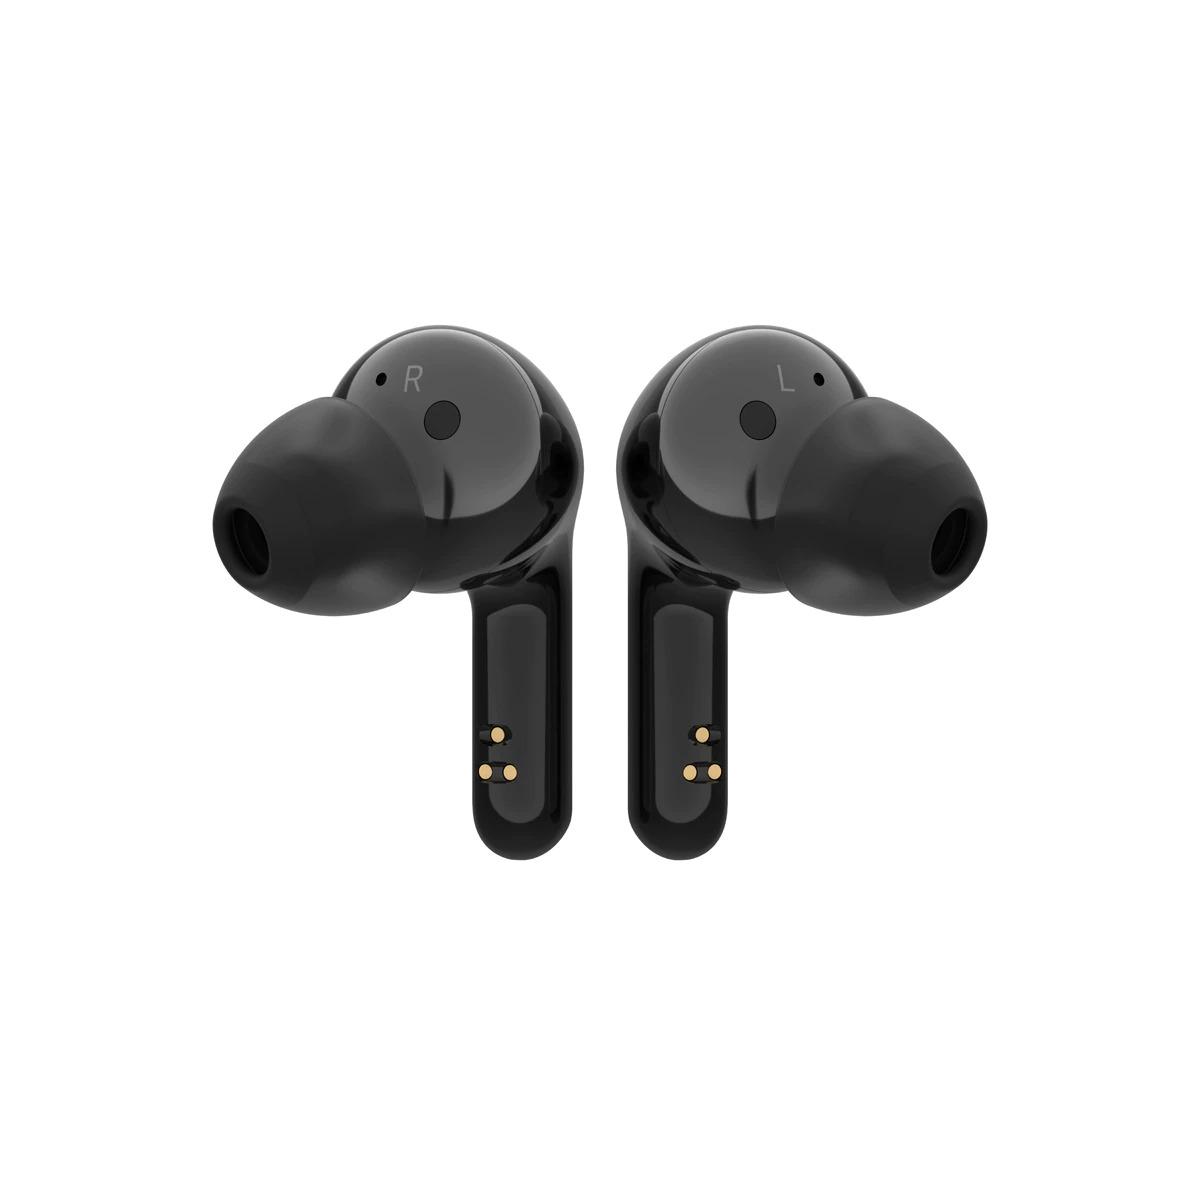 Auriculares de botón LG Tone Free HBS-FN4-B True Wireless, sonido Meridian, negros